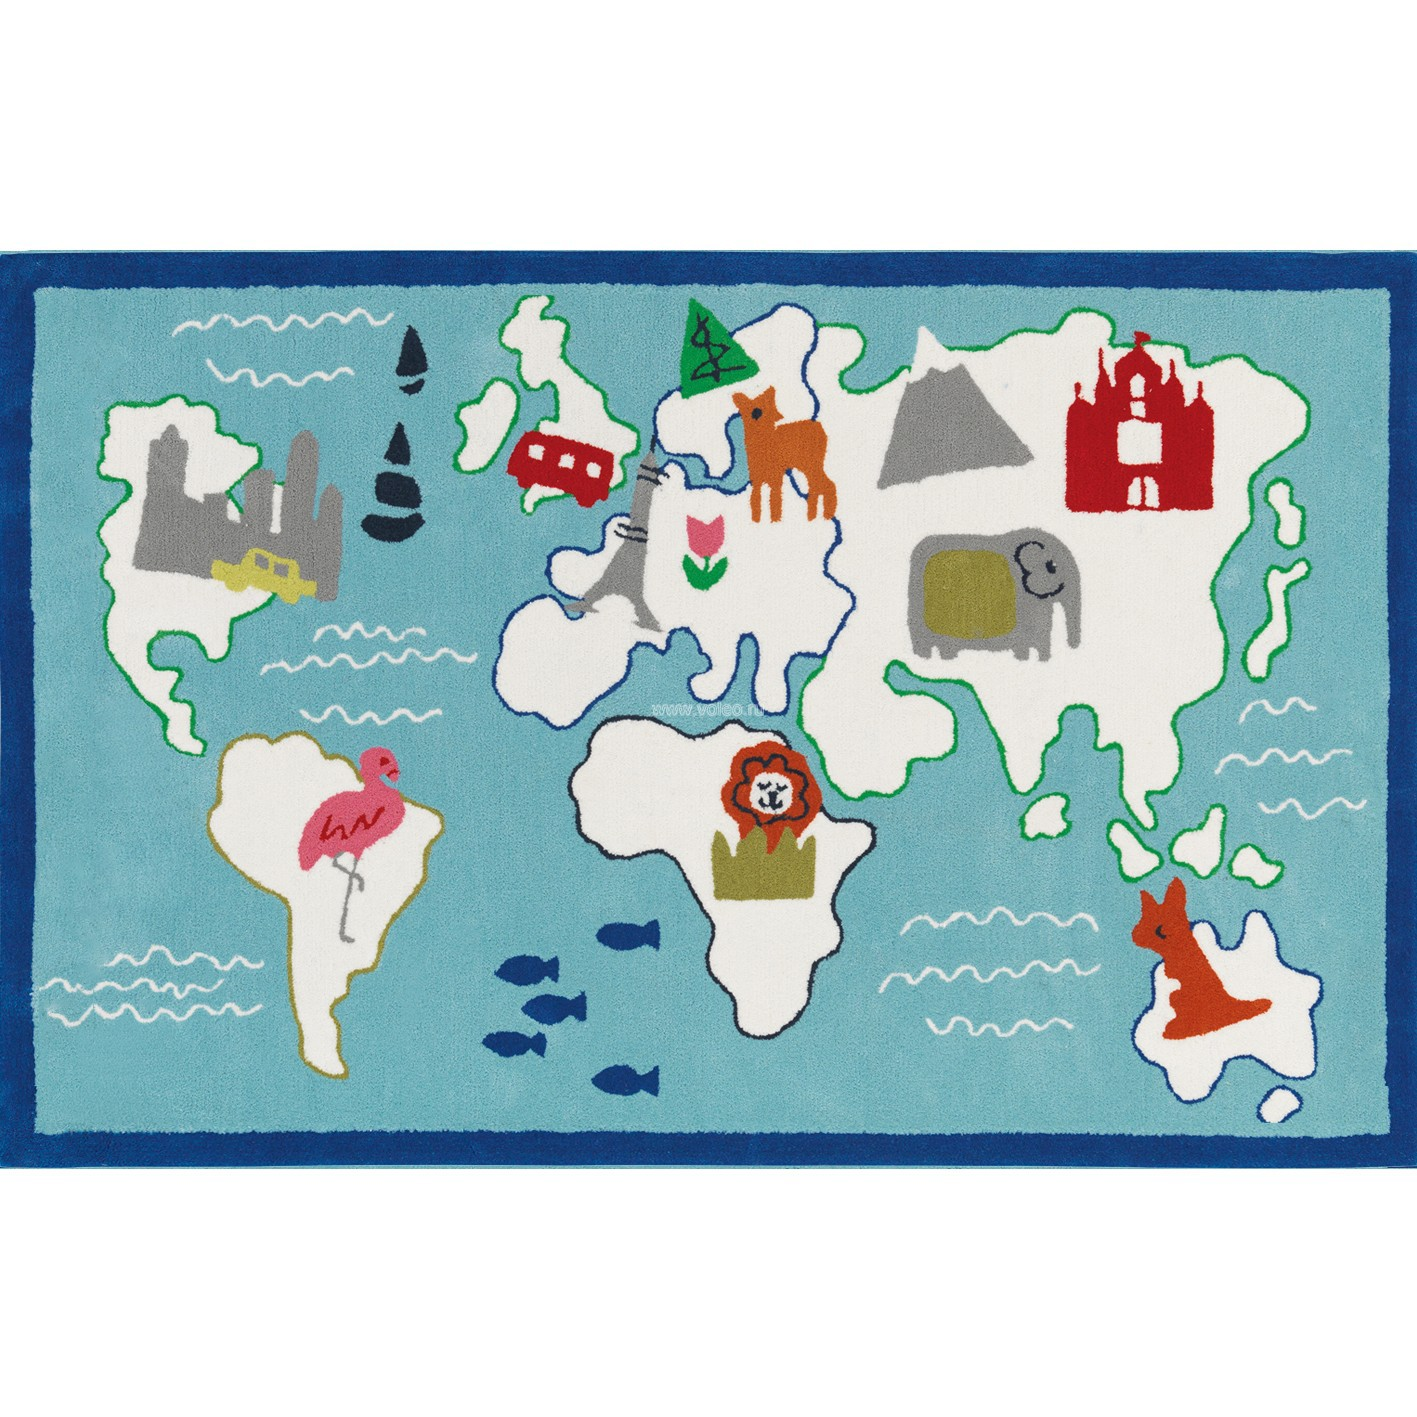 Ковер Designers Guild Kids Rugs Around The World DHR172/01, интернет магазин Волео